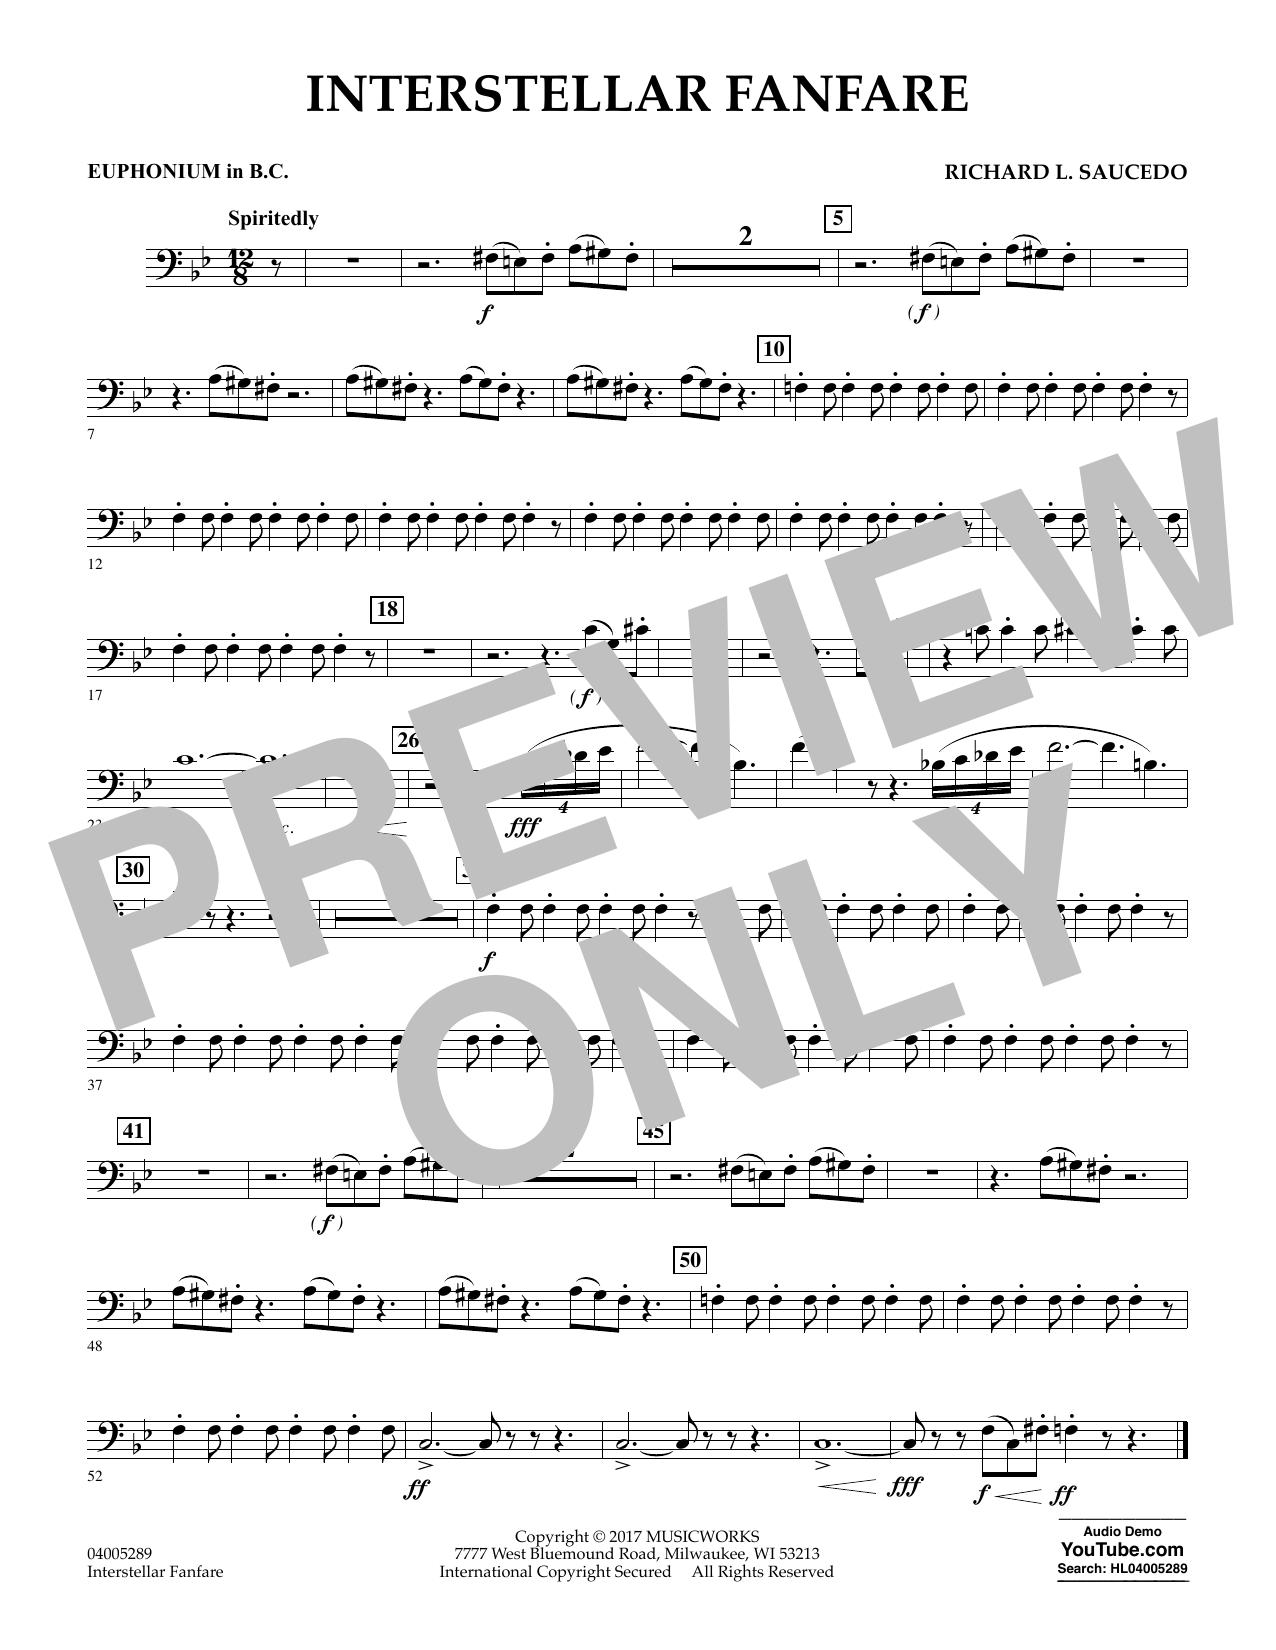 Interstellar Fanfare - Euphonium in Bass Clef (Concert Band)